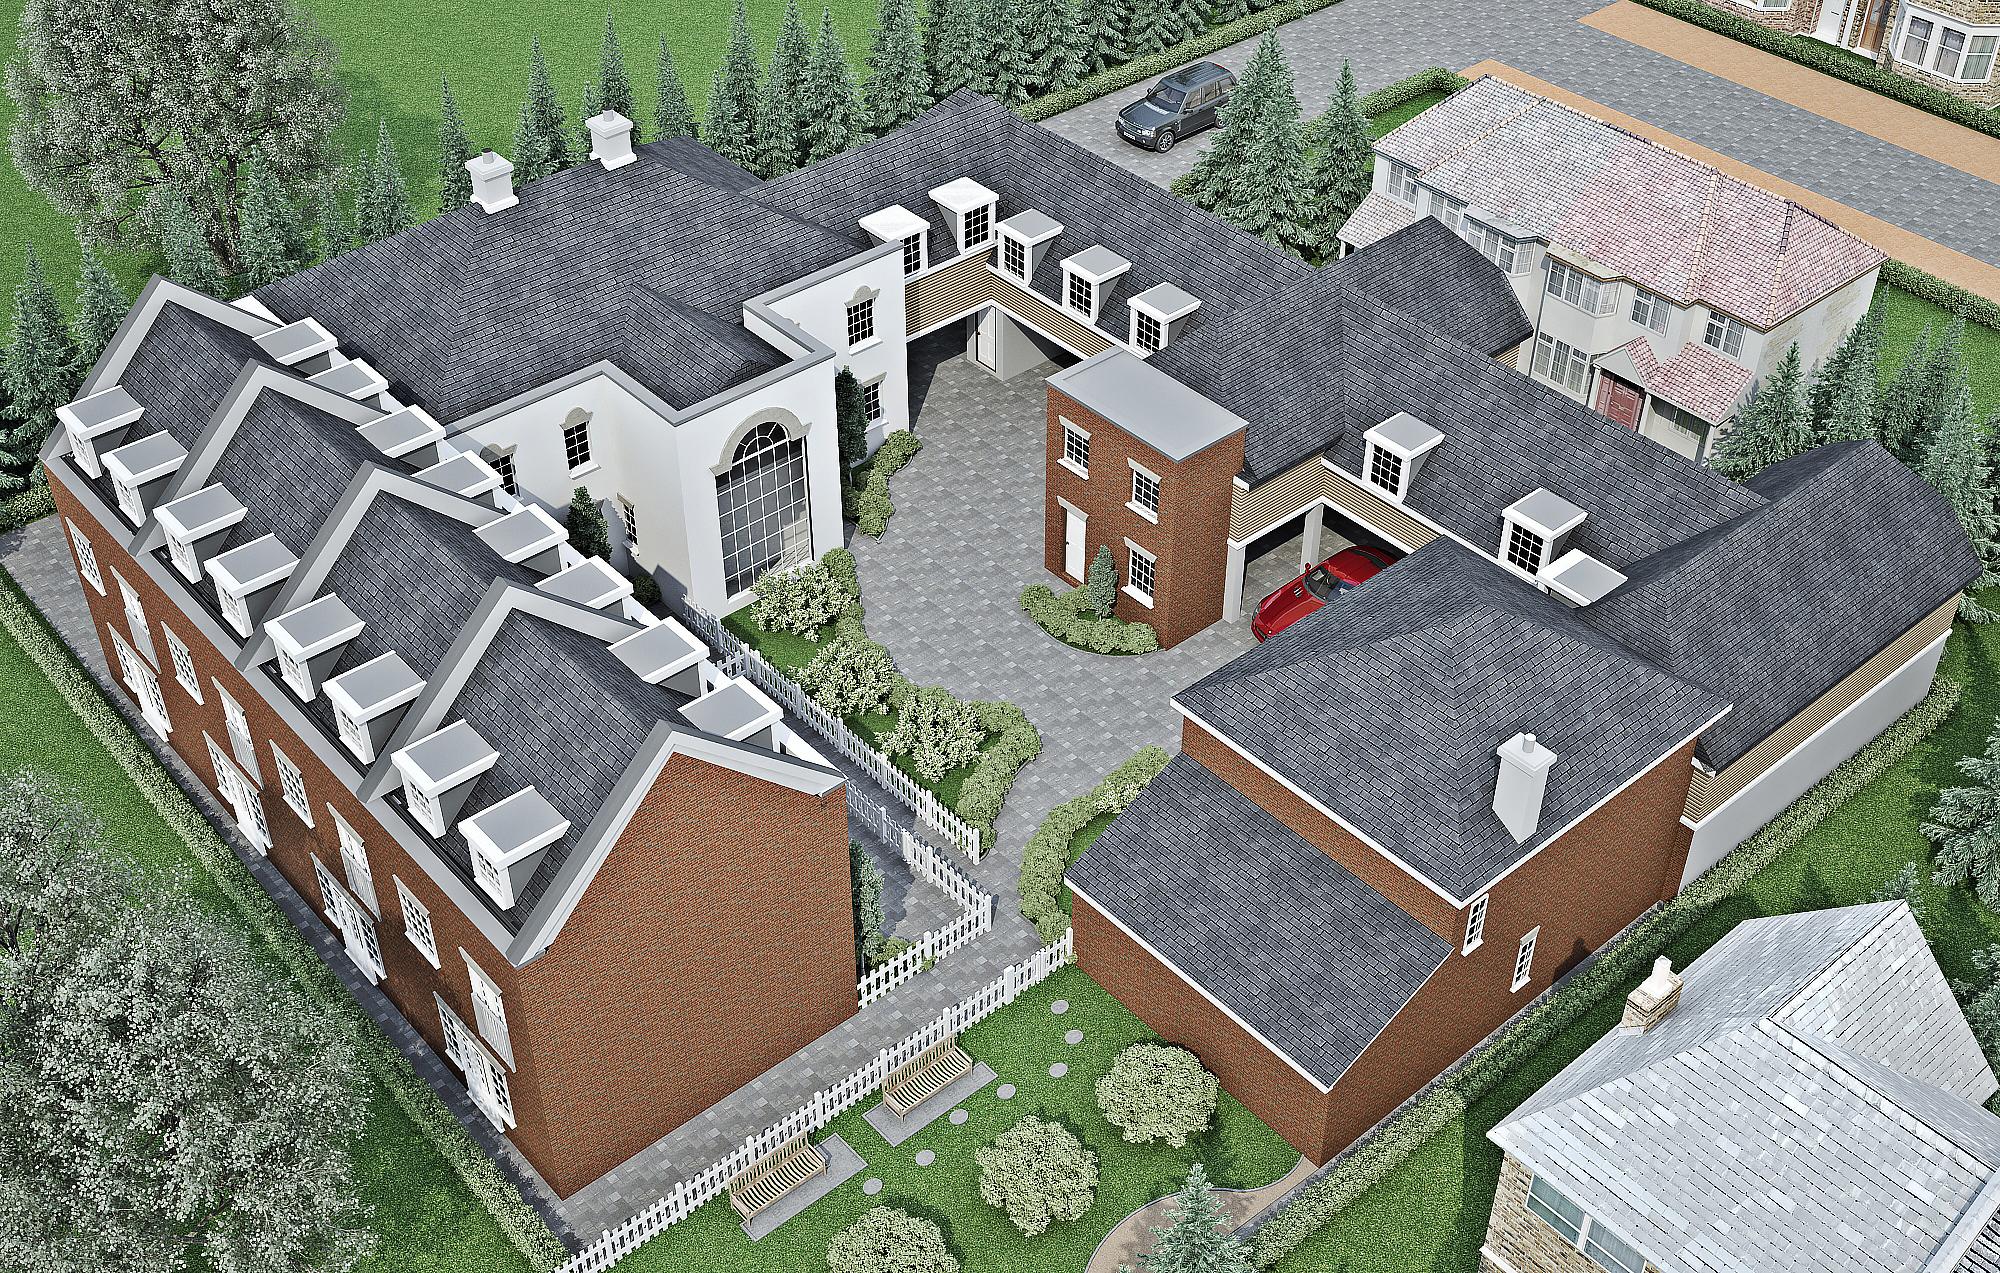 269-Town House Exterior v2